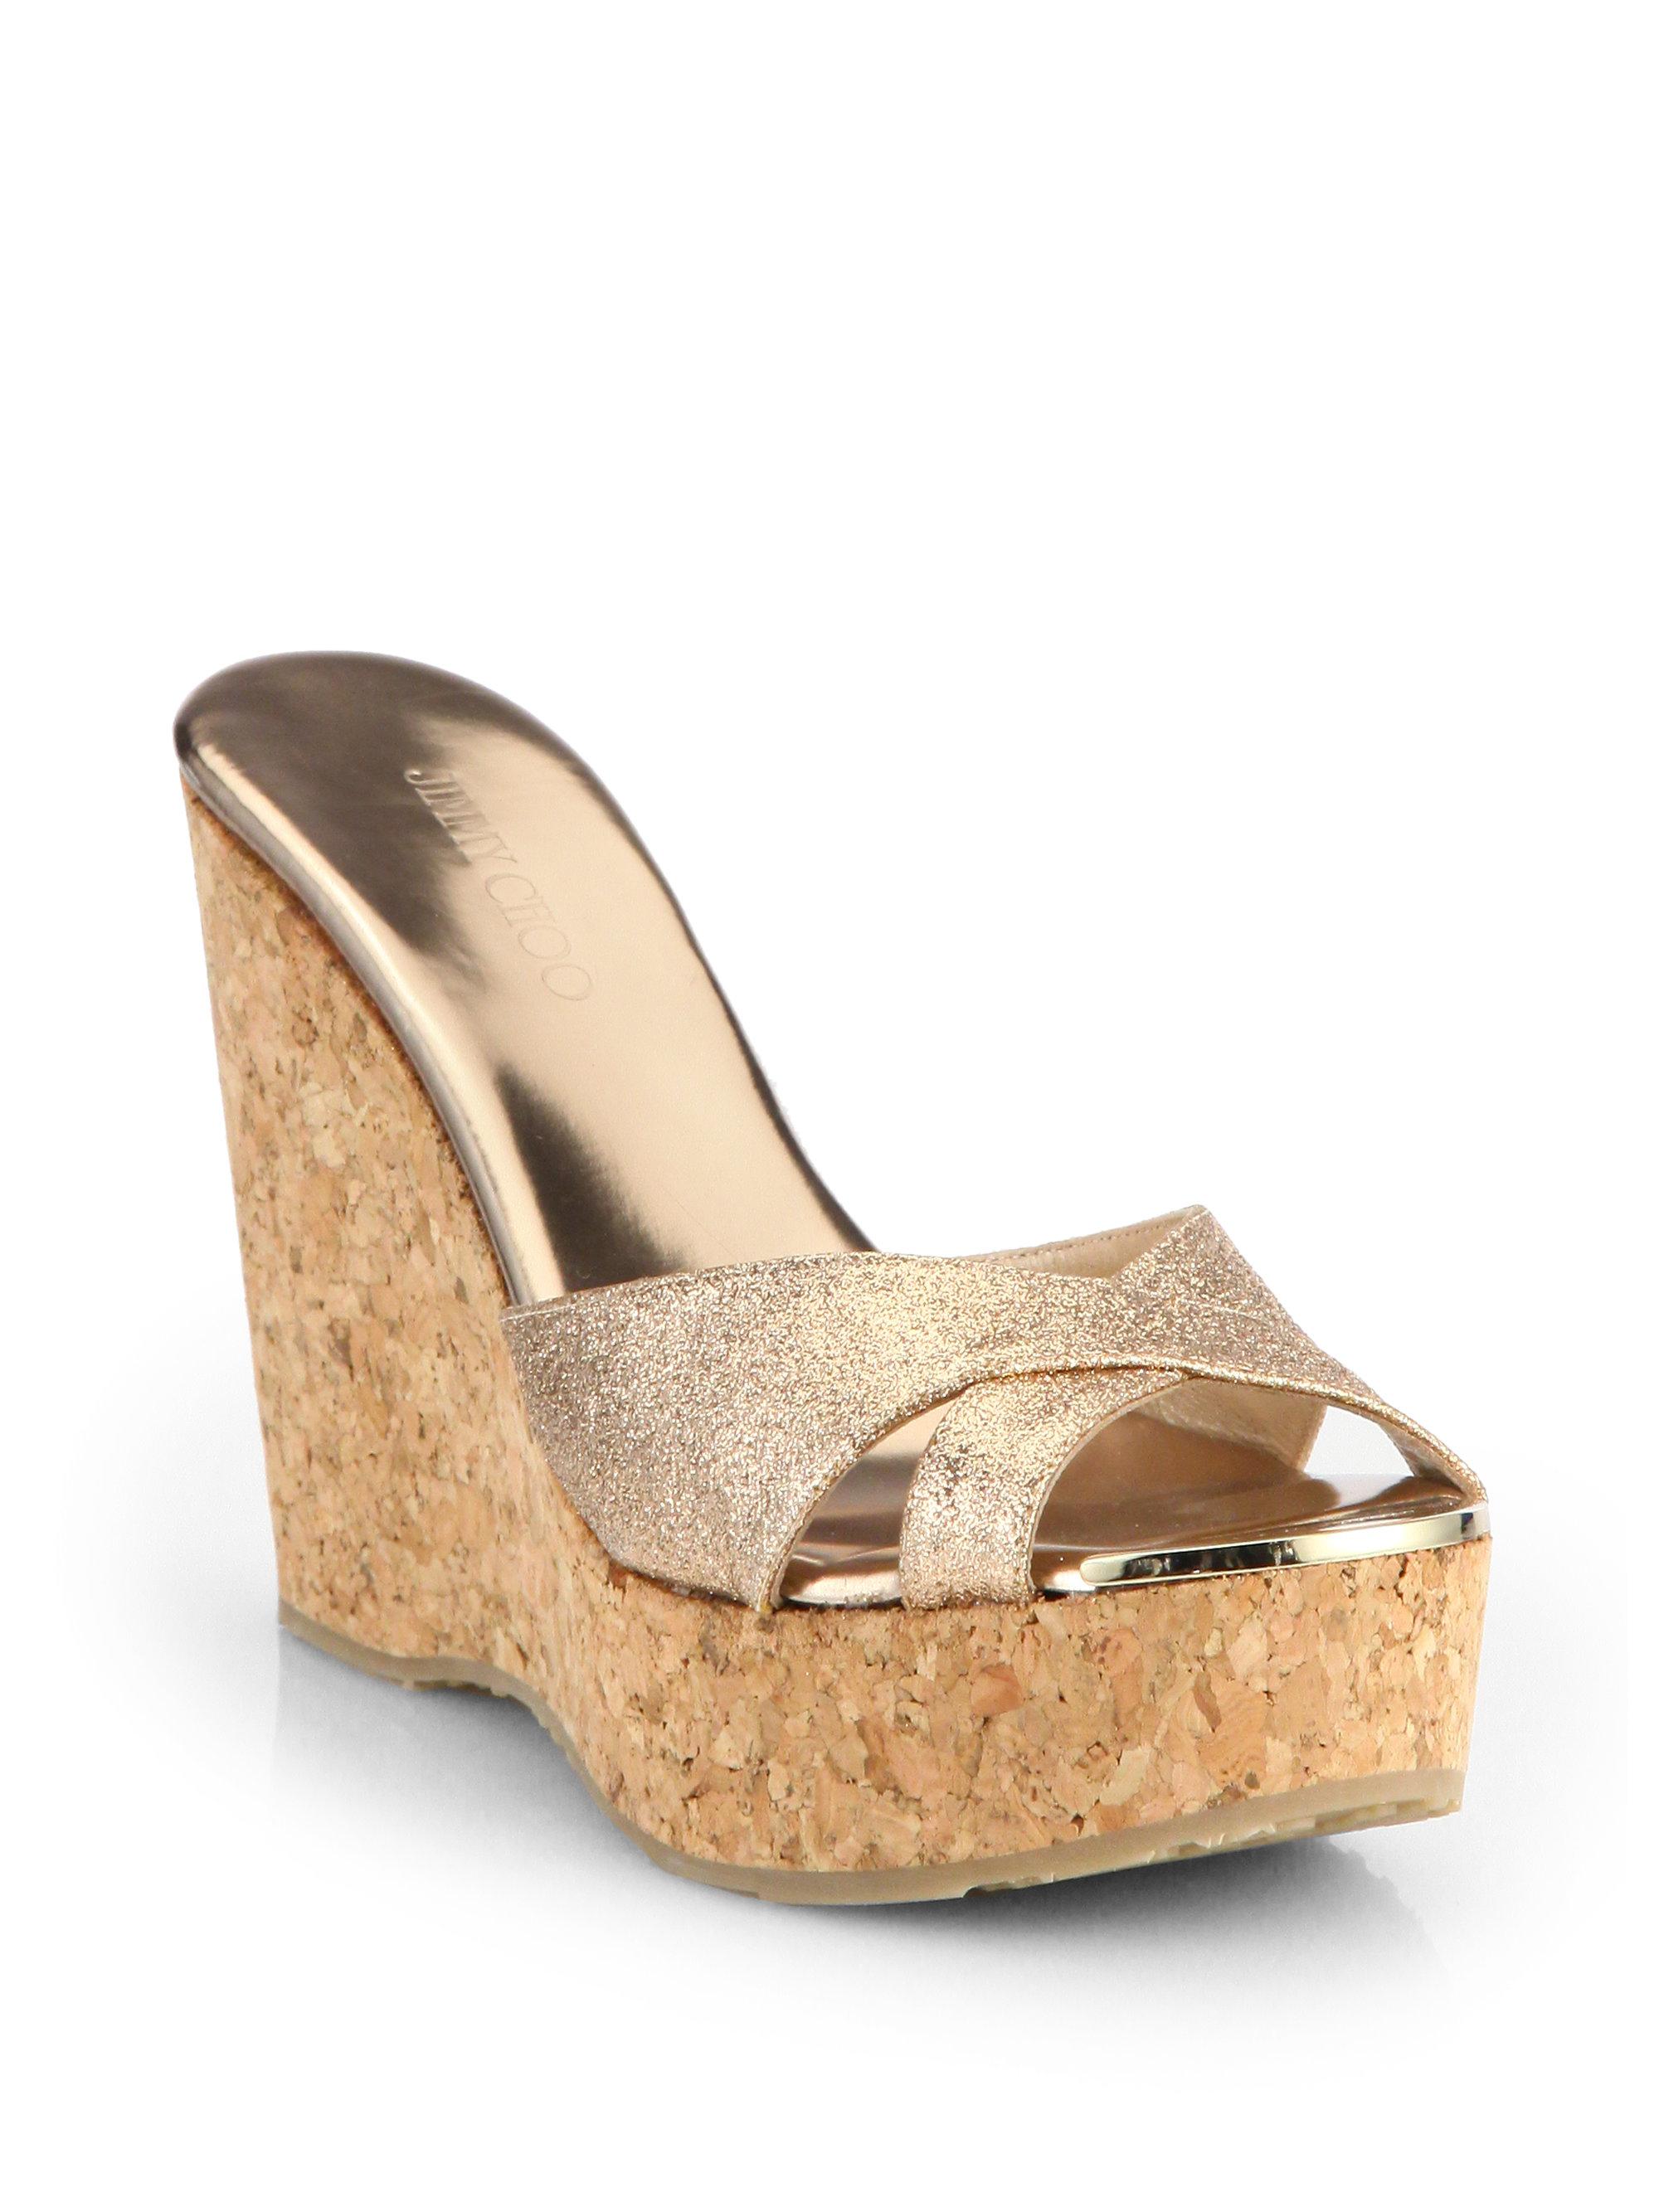 ee4468ec2ce ... womens shoes gold 9c700 ba4b0  czech jimmy choo perfume glitter cork wedge  sandals in pink lyst 465d6 c860b